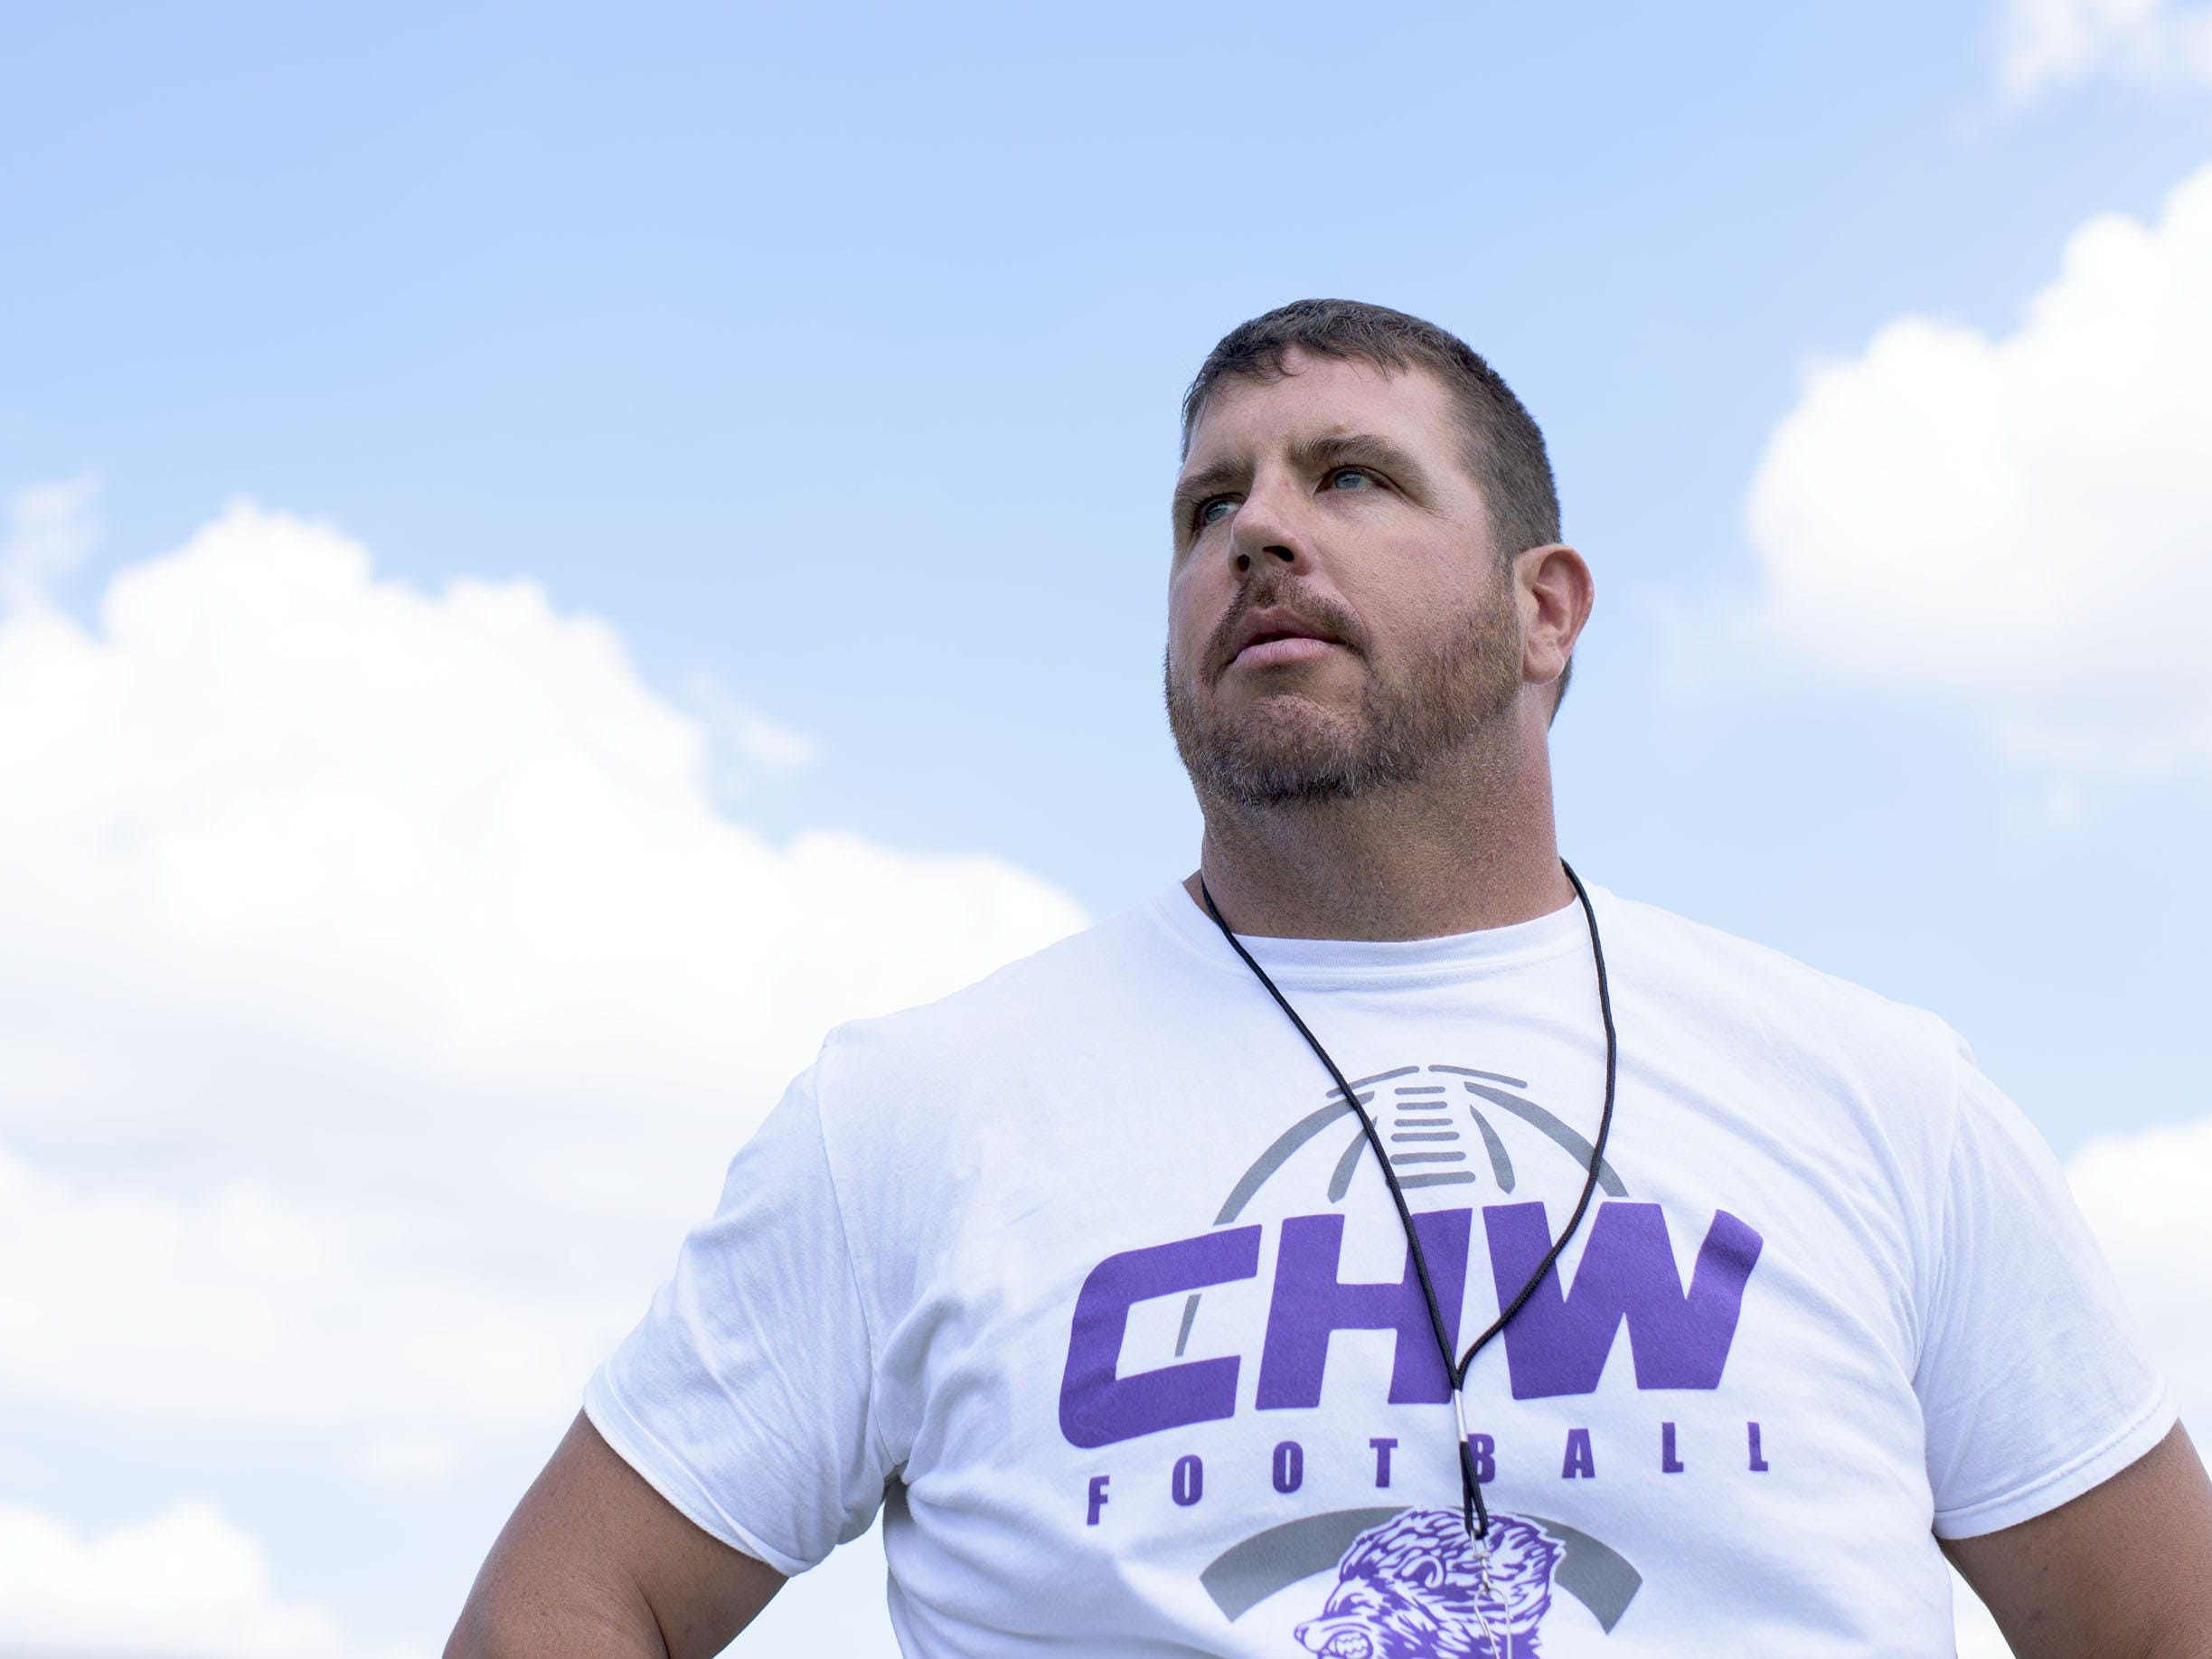 Cherry Hill West head coach Brian Wright